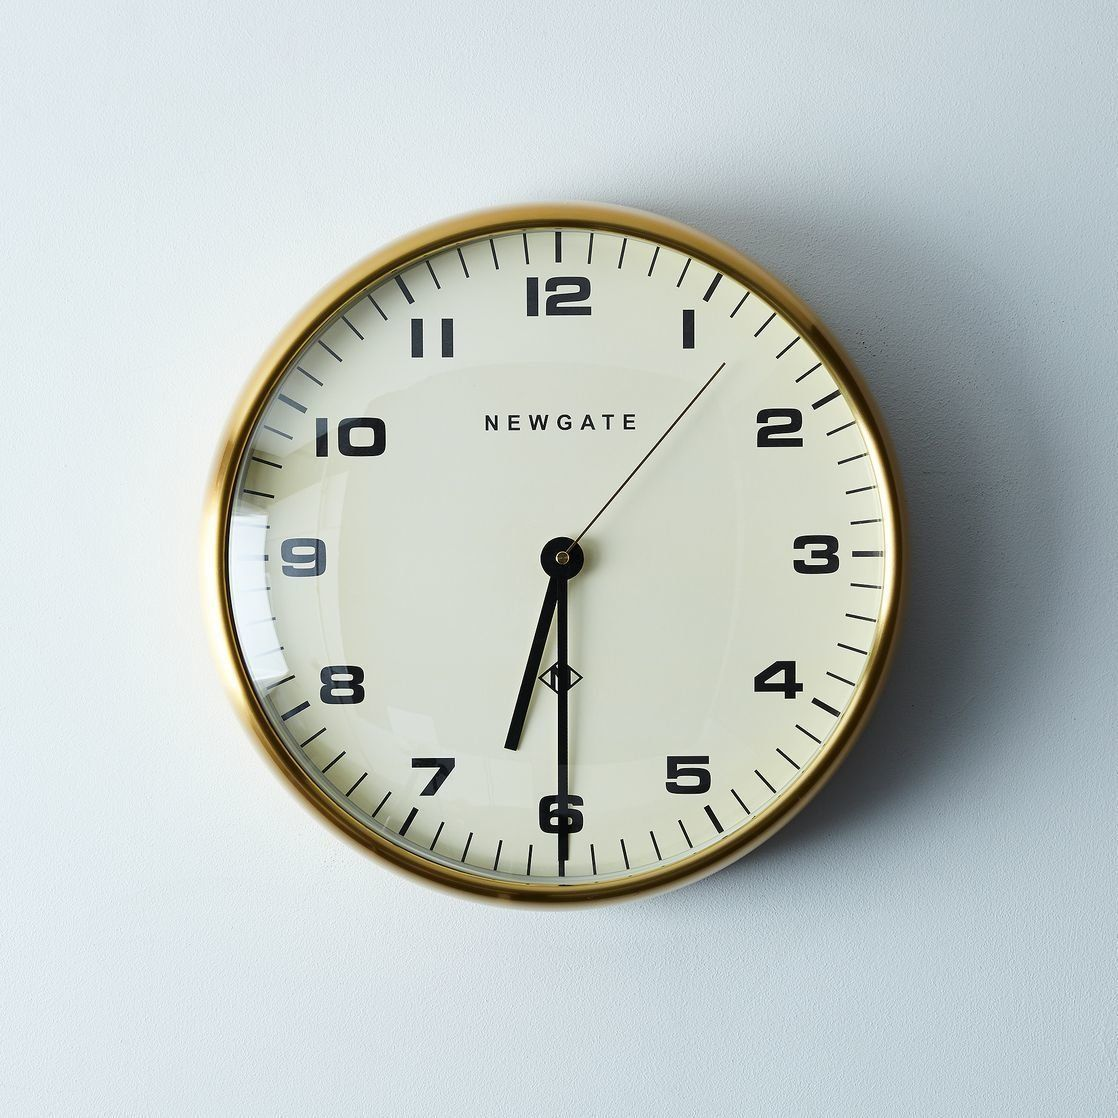 Chrysler Brass Wall Clock by Food52   Wall clocks, Clocks and Walls